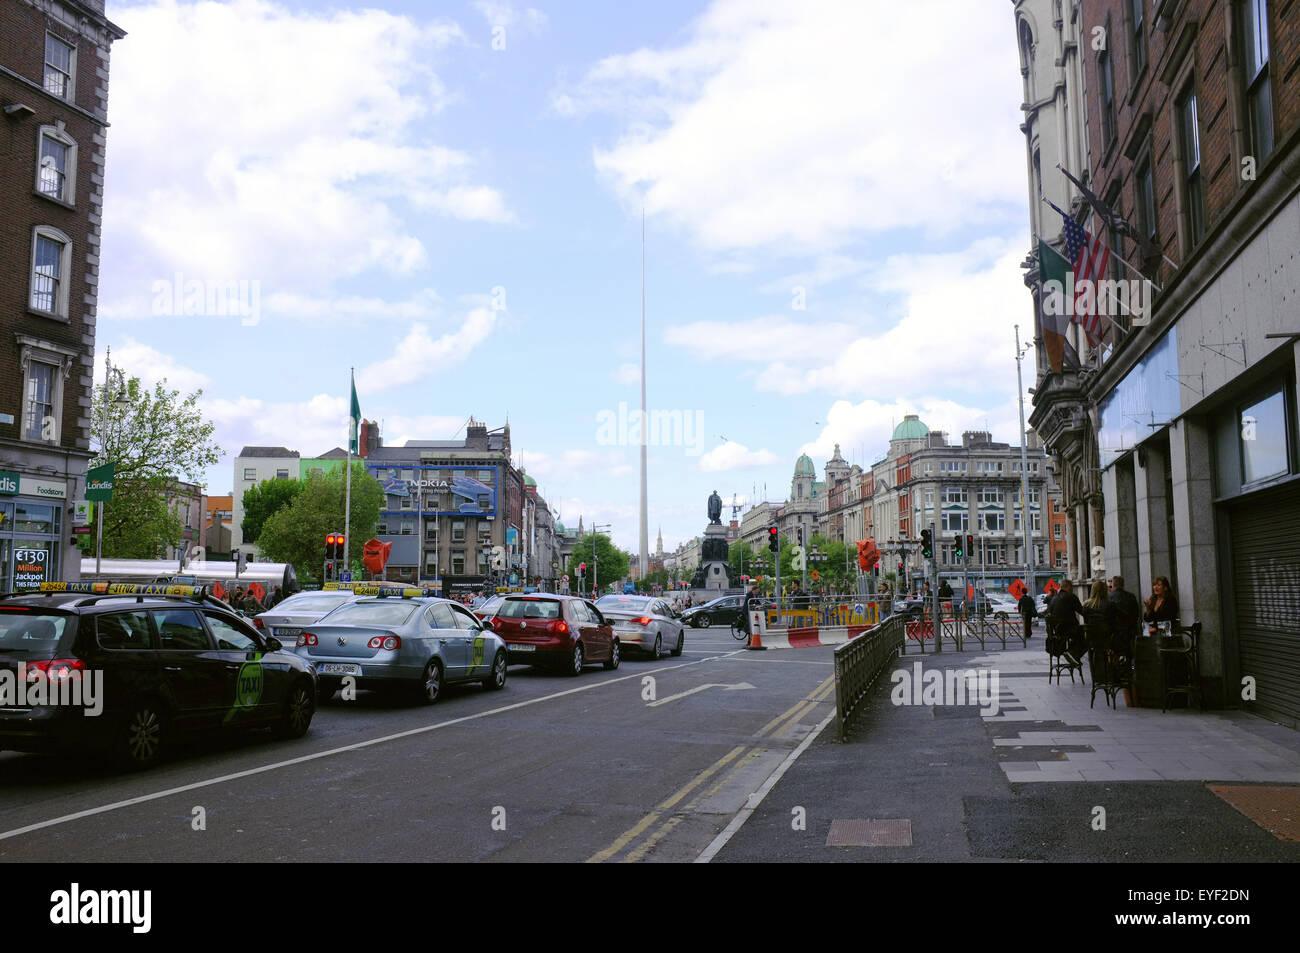 Traffic heading towards The Spire of Dublin. - Stock Image